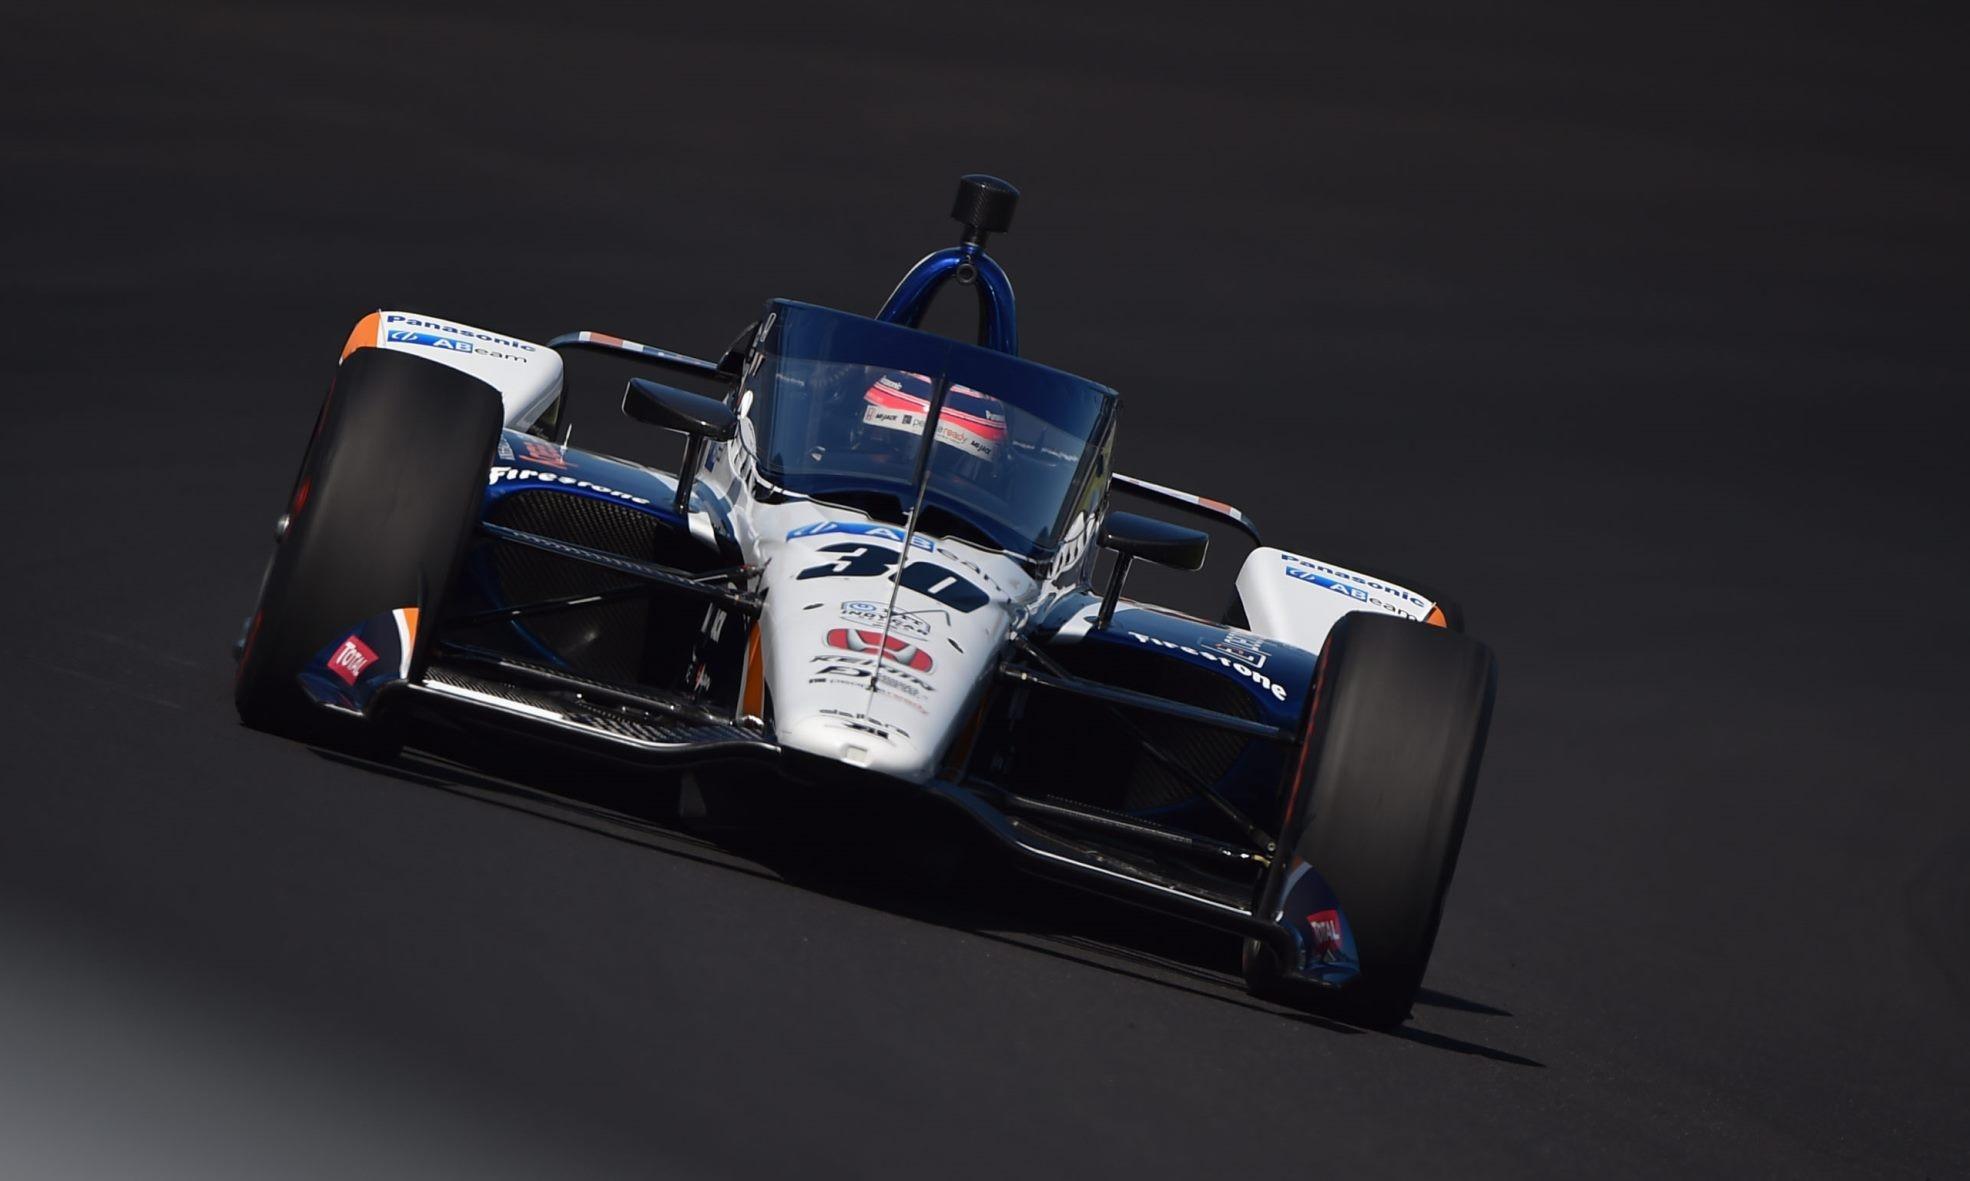 Takuma Sato wins 2020 Indy 500